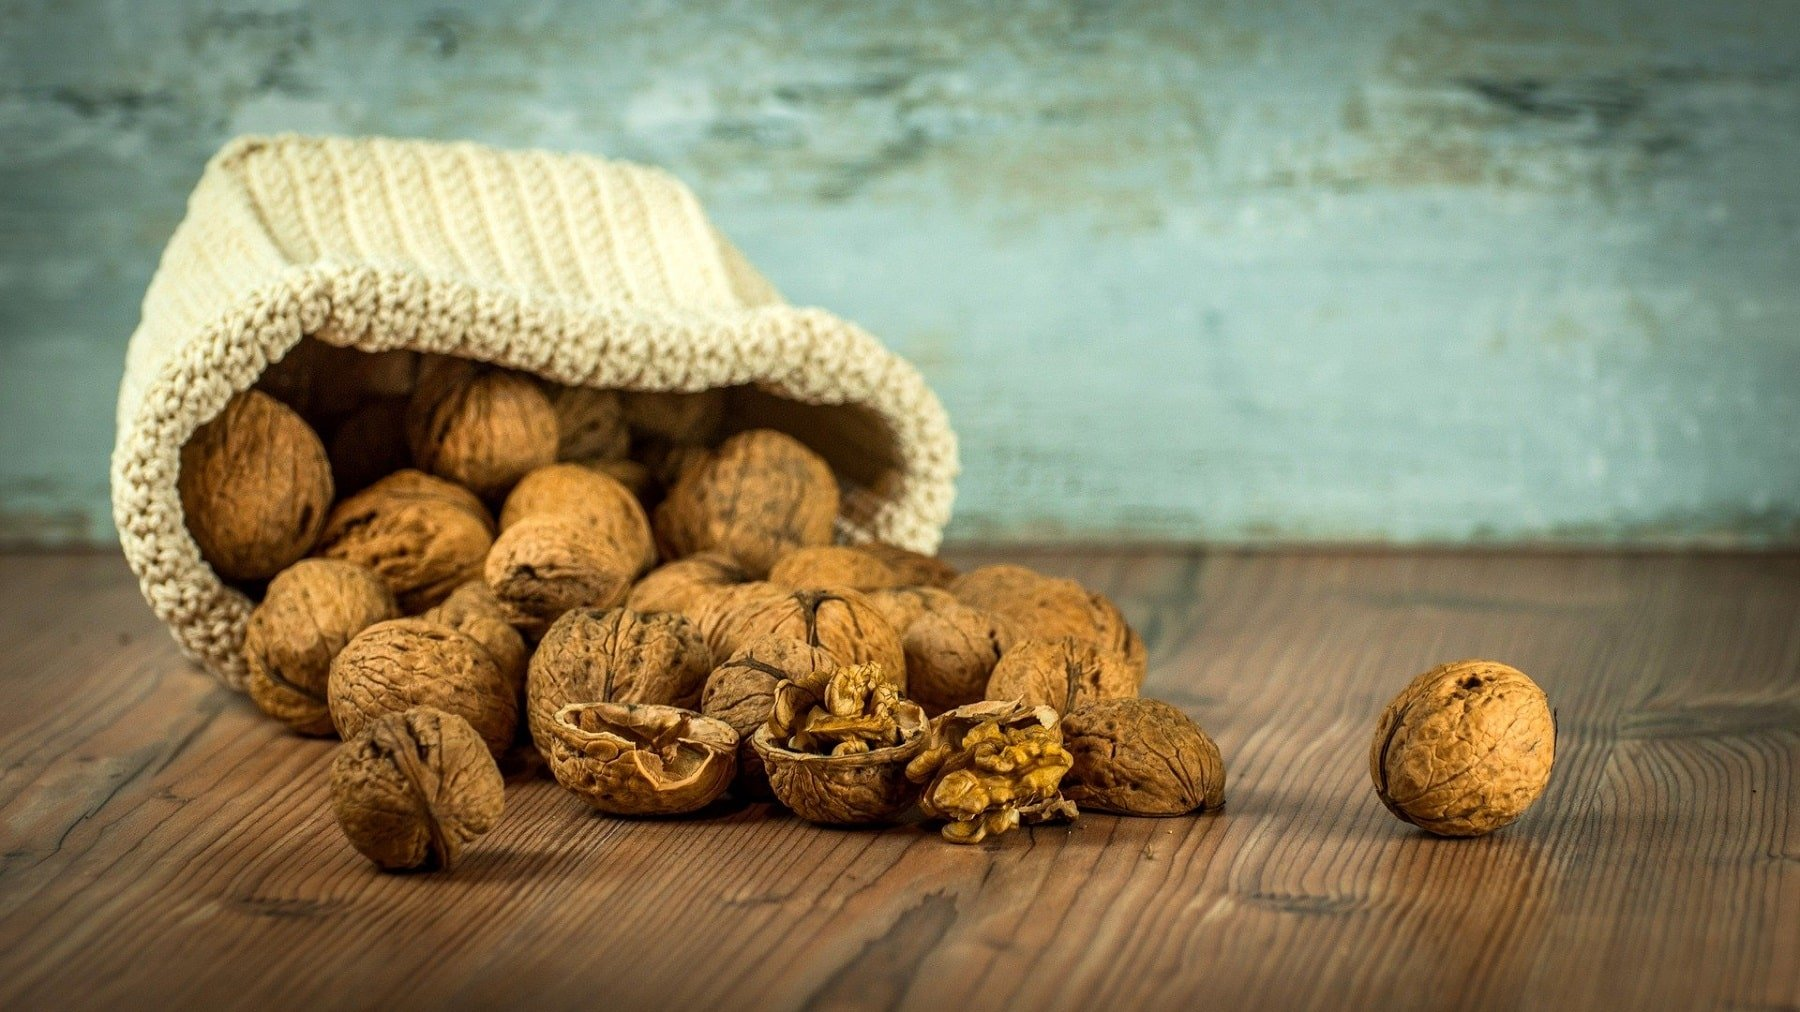 Las 4 mejores fuentes de grasas Omega 3 para veganos